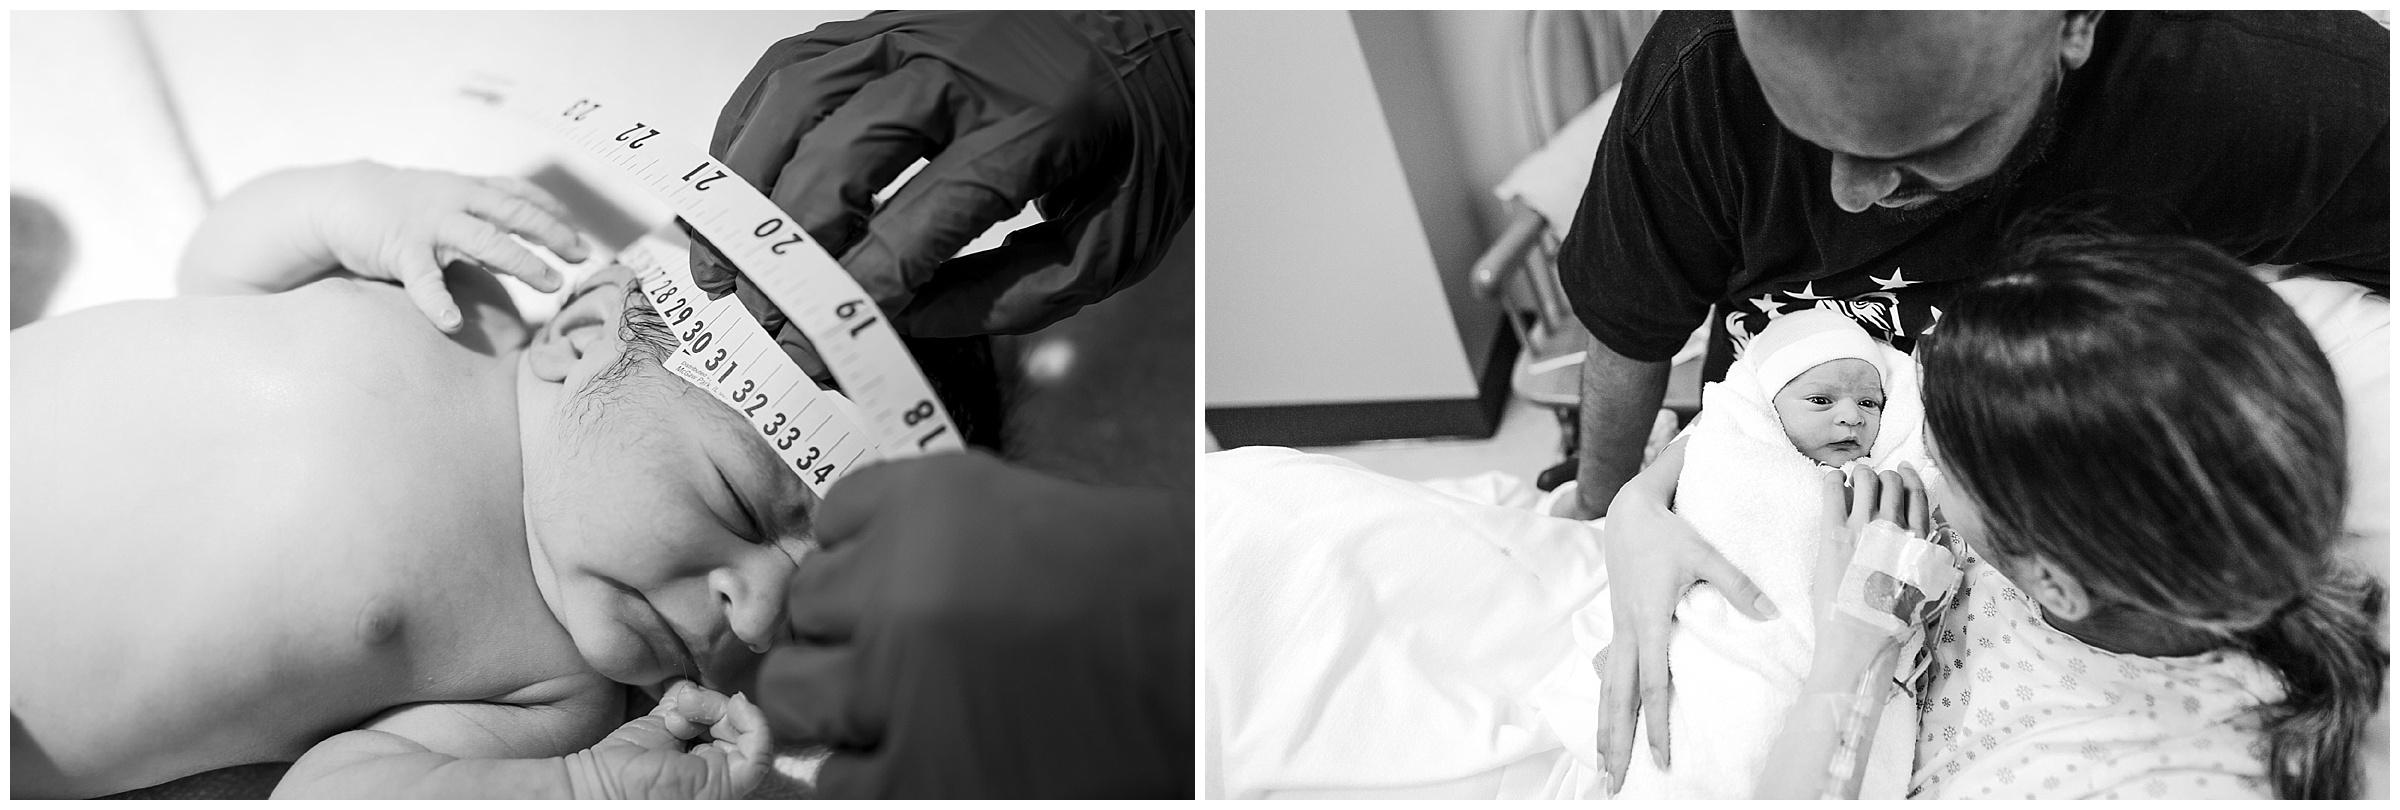 baby-born-fresh-48-surrey-memorial-birth-photographer